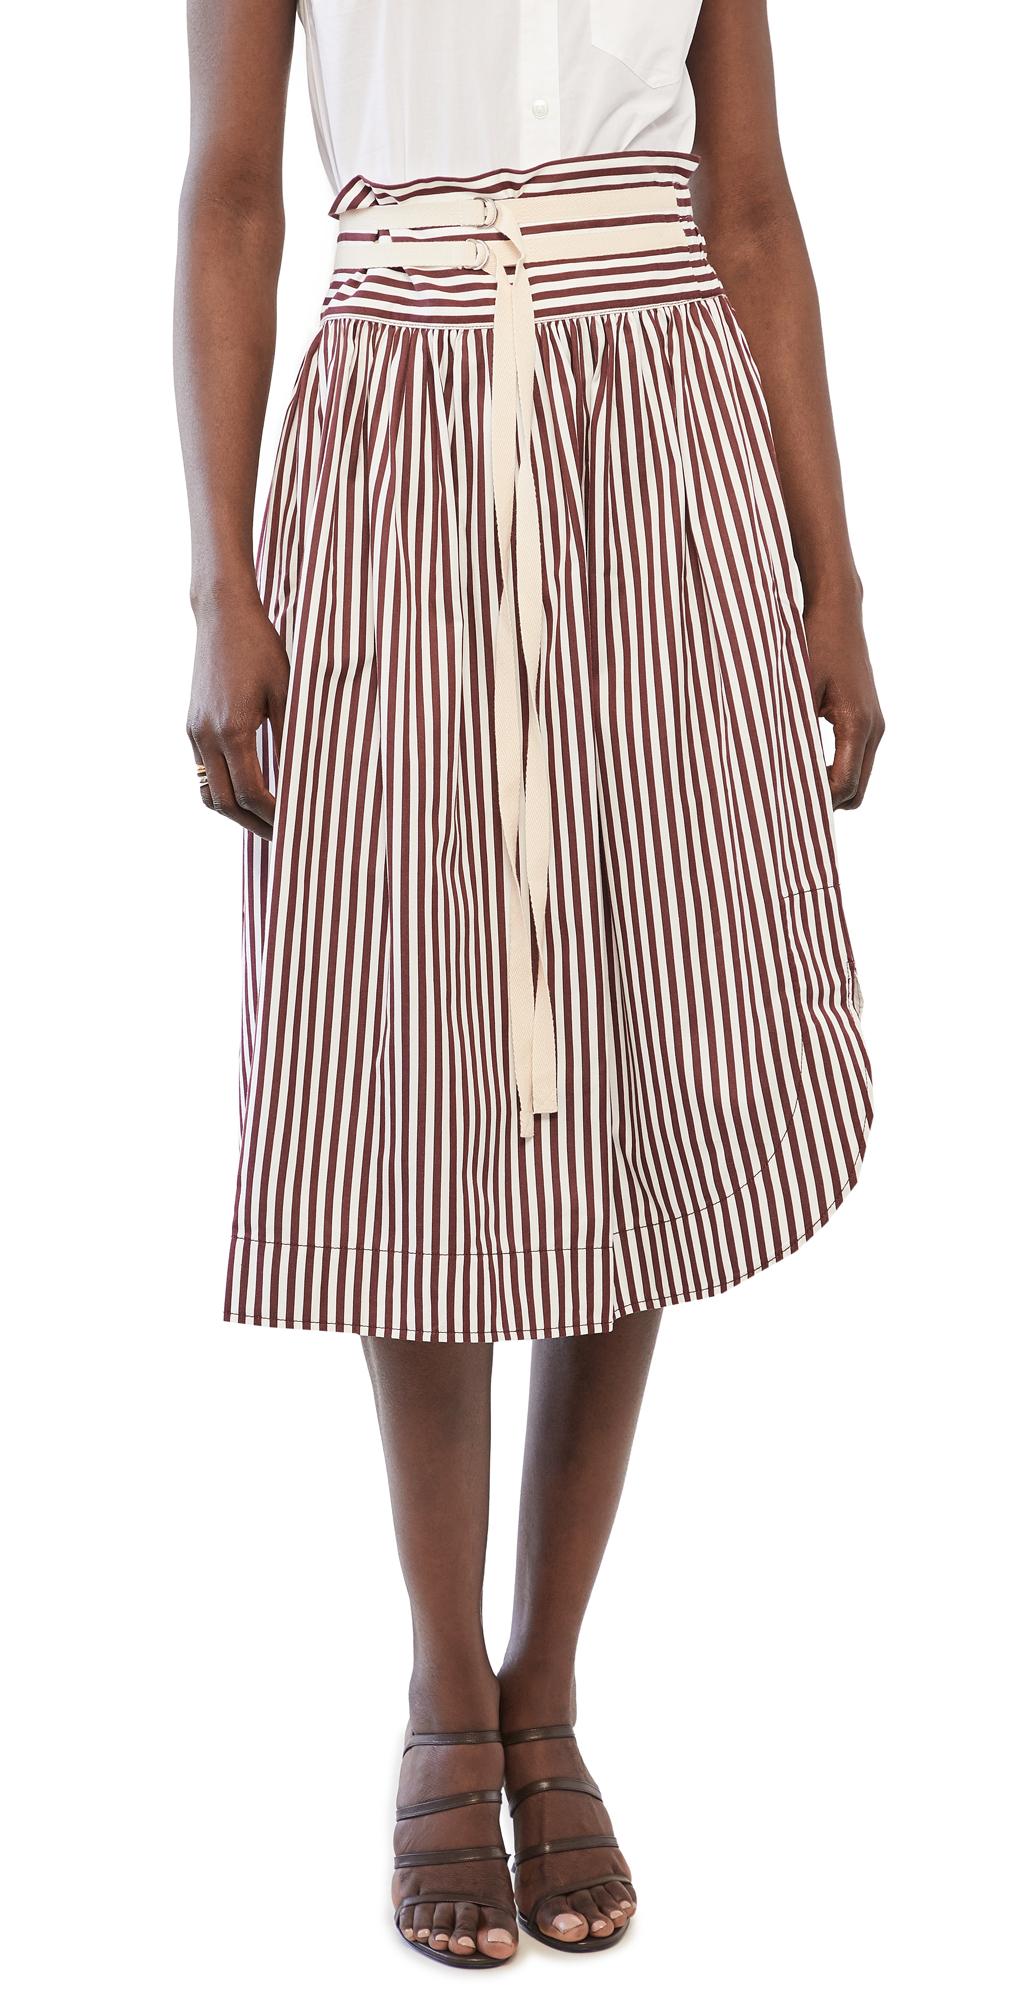 Lee Mathews Grace Stripe Skirt